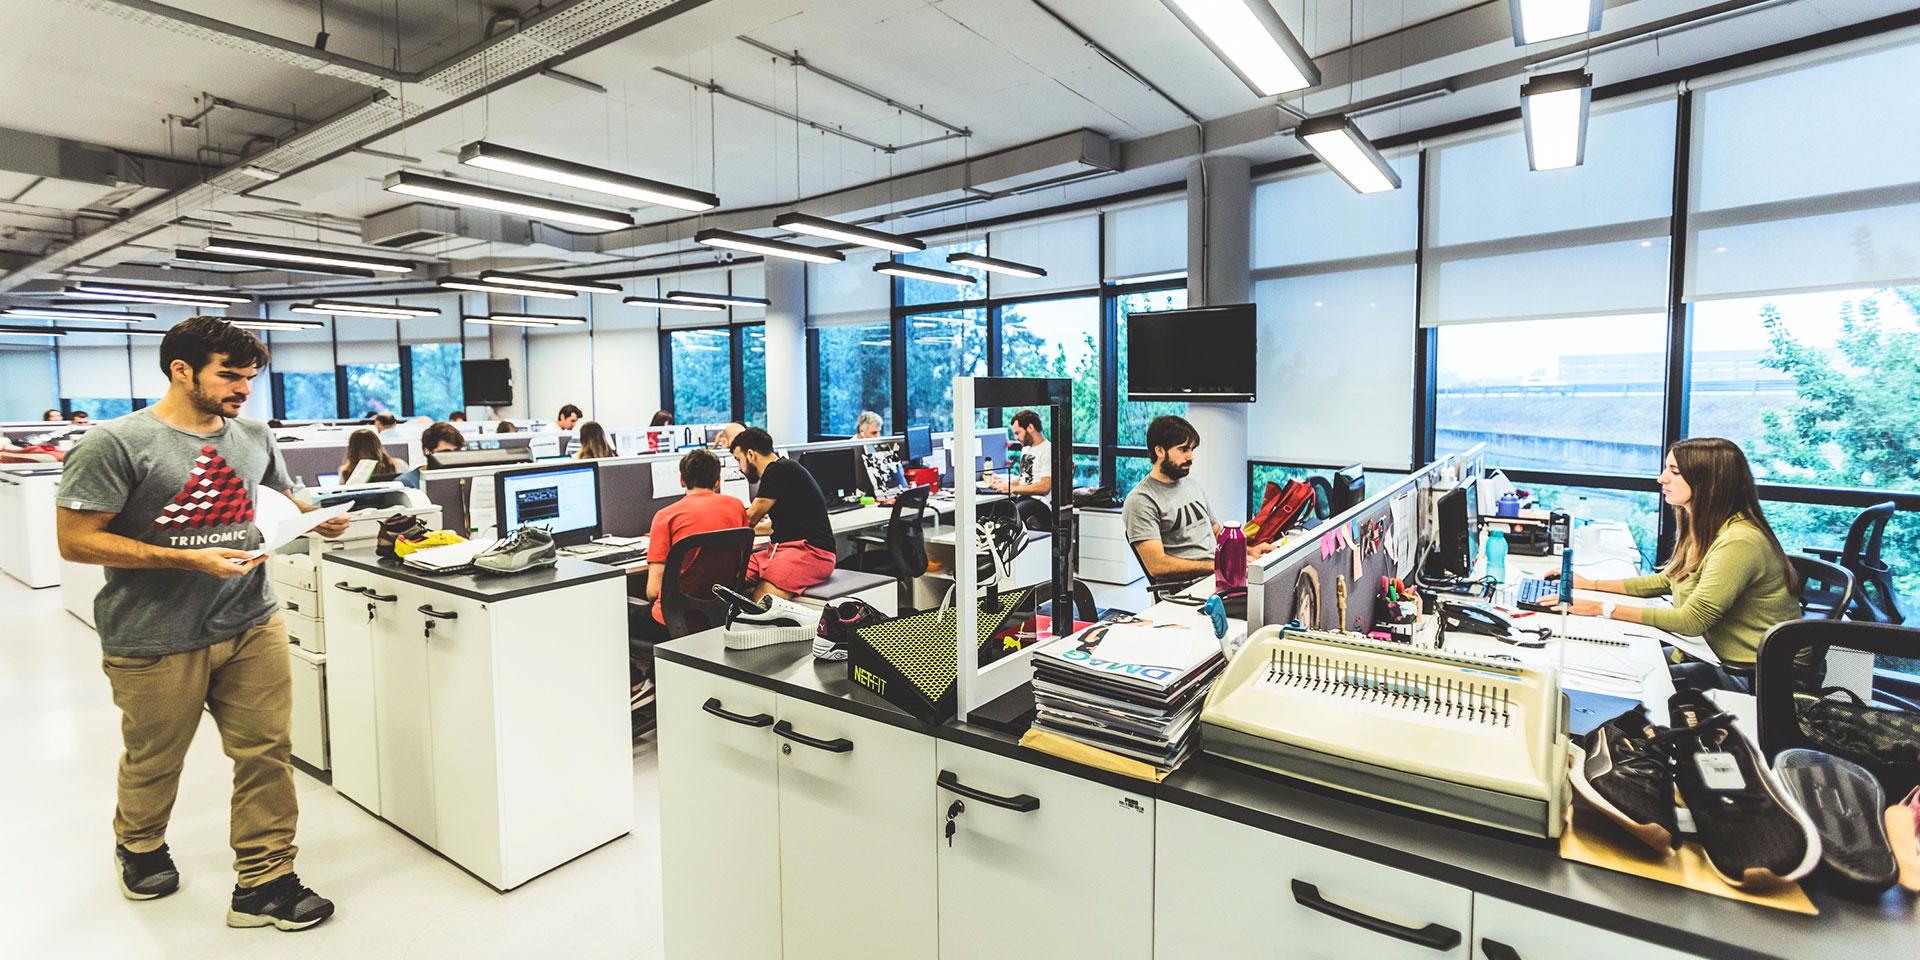 PUMA® - Argentina's central office in Pilar